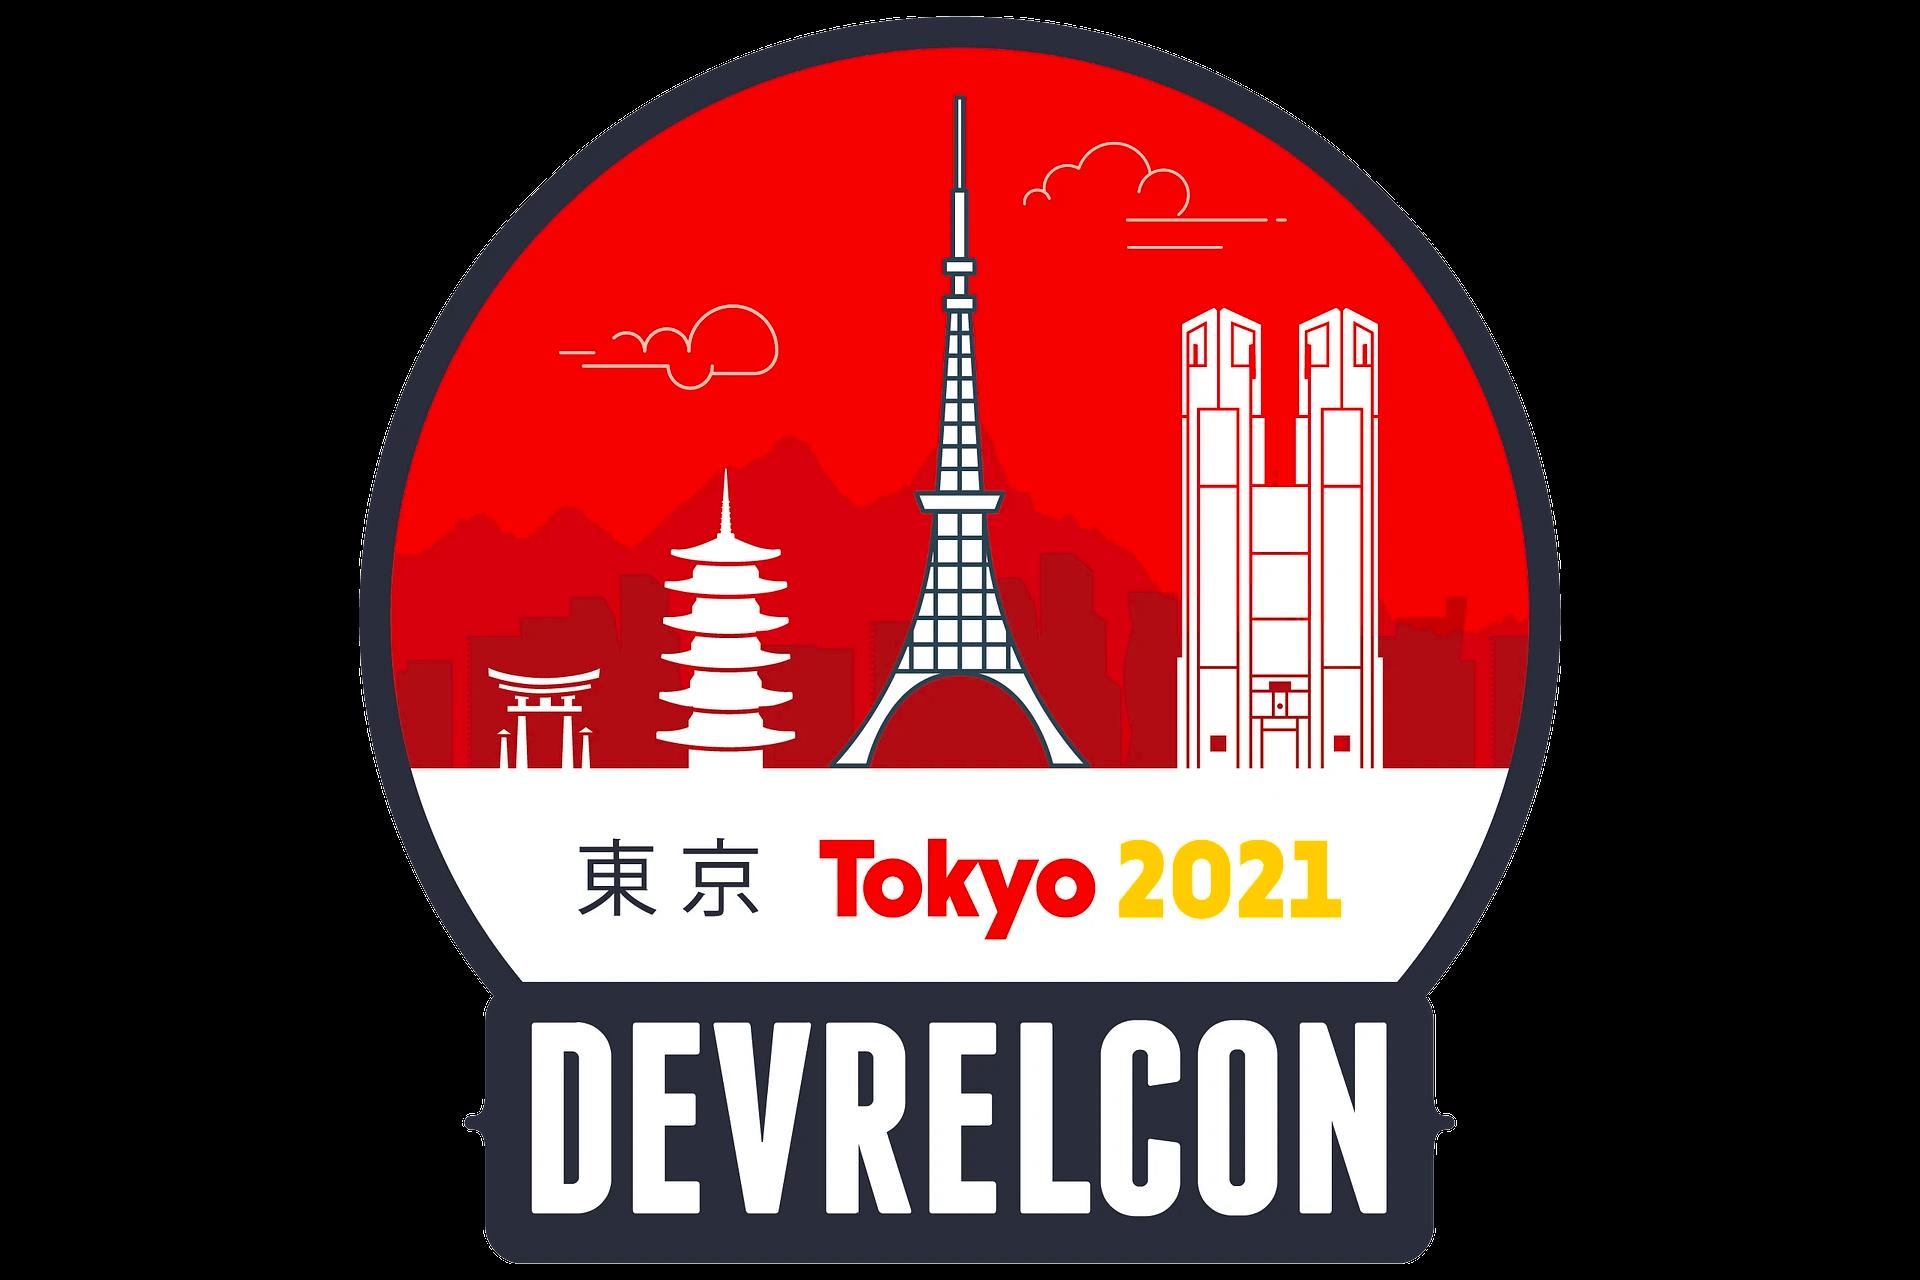 DevRelCon Tokyo 2021 logo